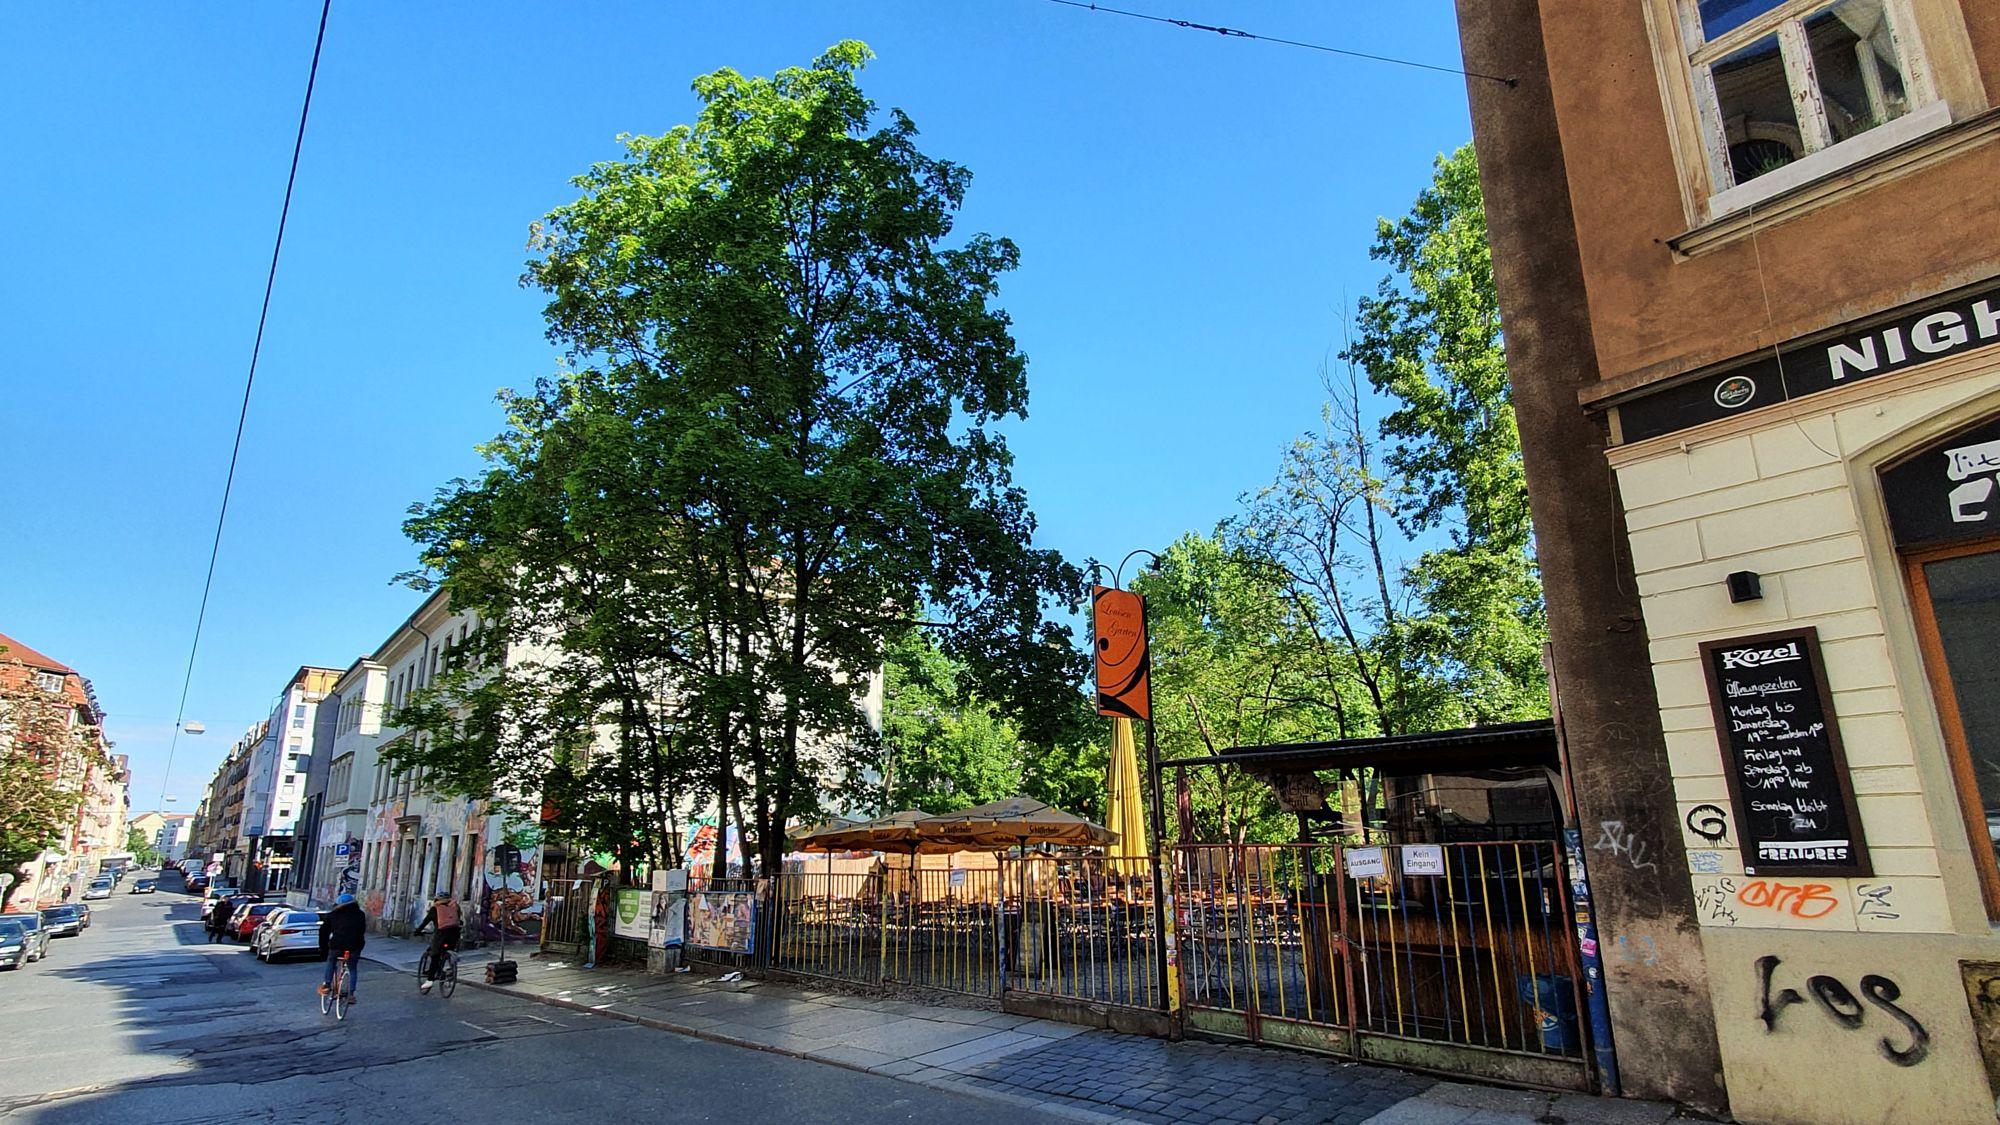 Louisengarten in der Louisenstraße